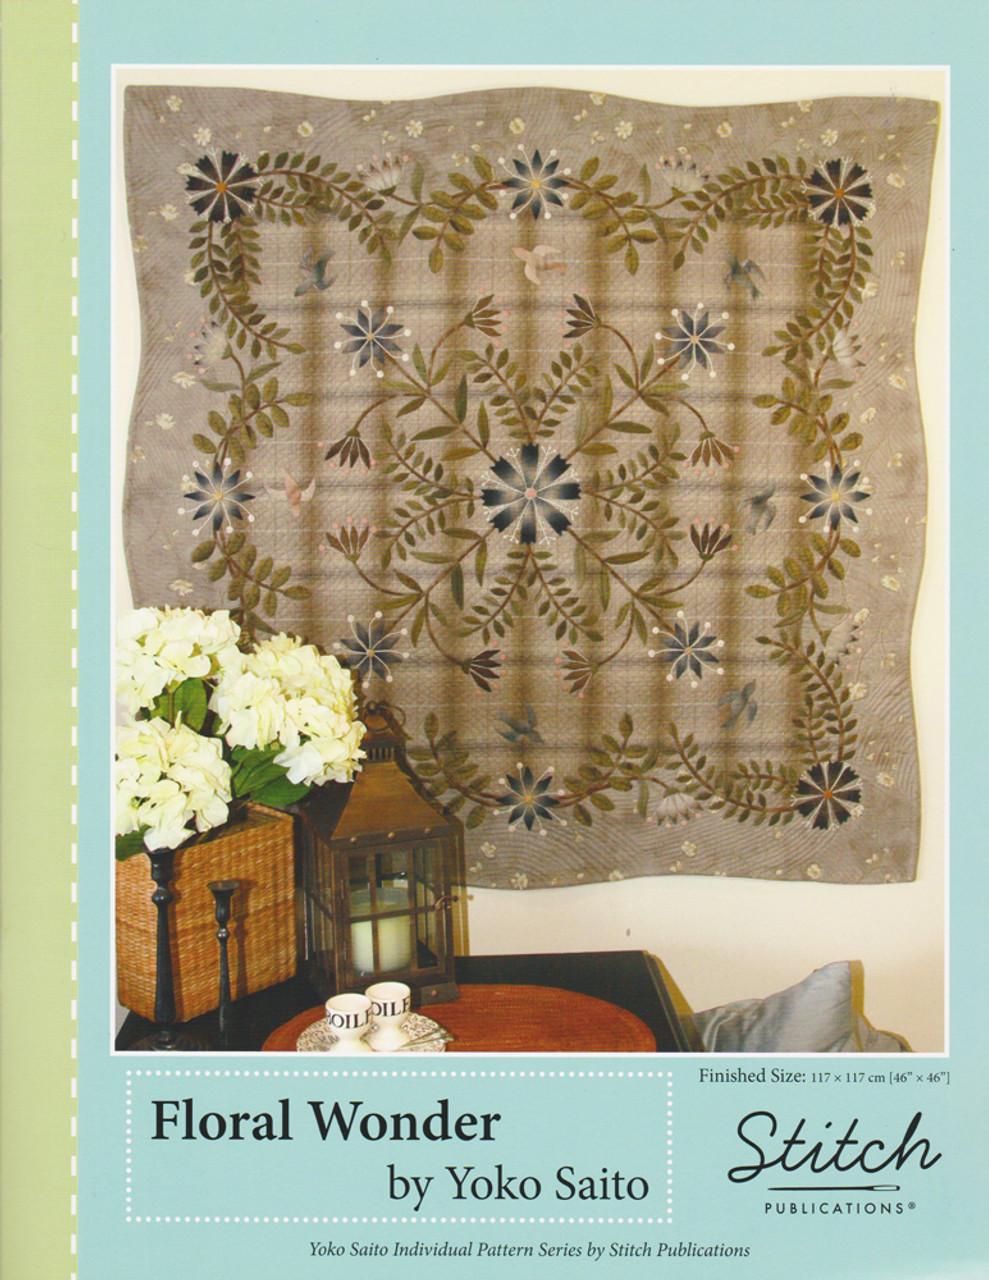 Floral Wonder Quilt Pattern Pys-974689 - Bebe Bold Japanese Textiles  Craft-2085